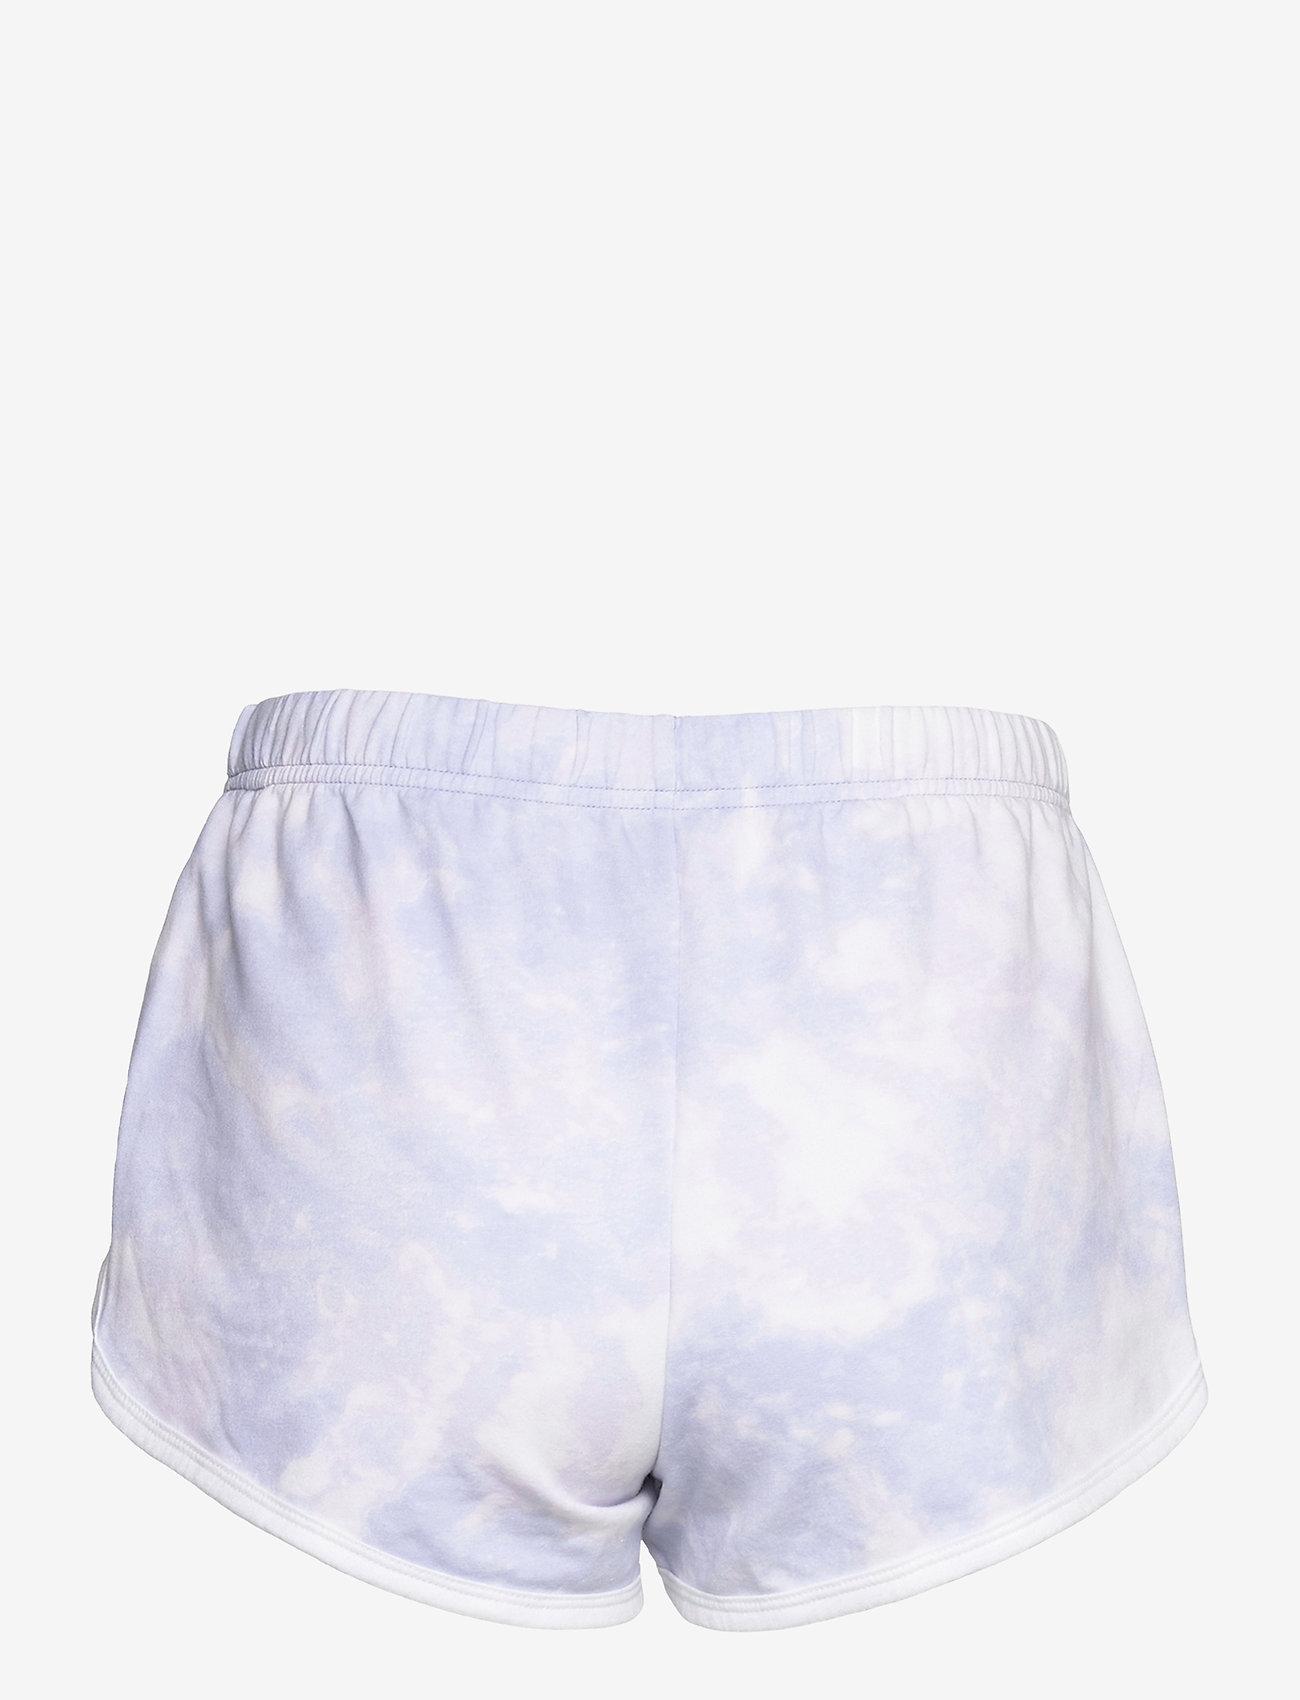 Hollister - HCo. GIRLS SHORTS - shorts casual - wash effect - 1